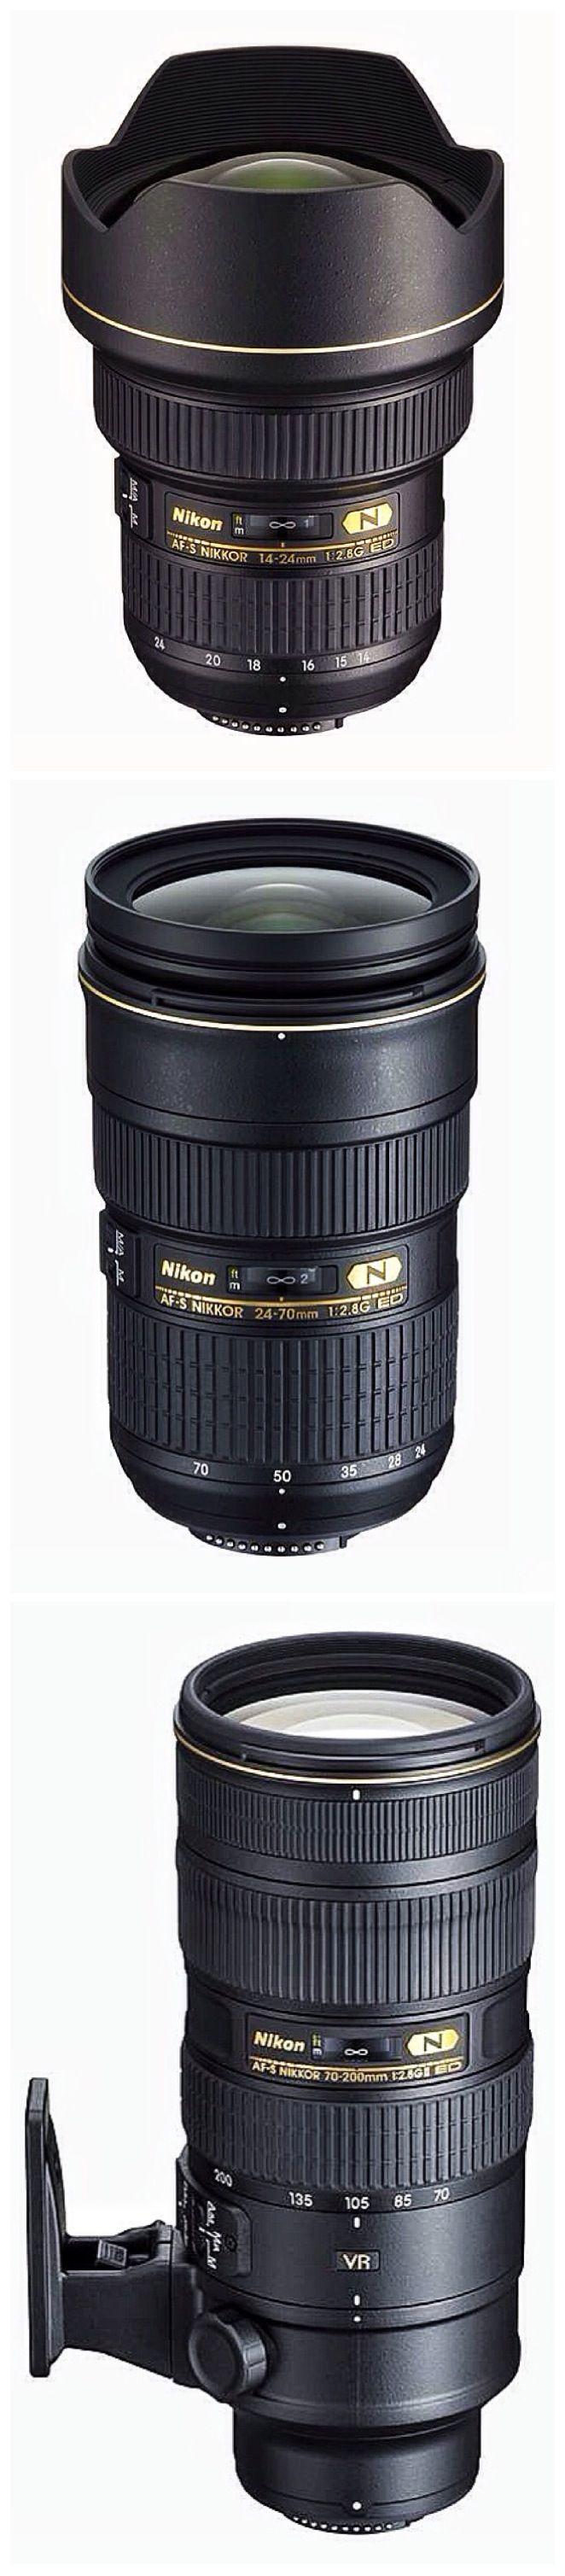 "Nikon's ""Holy Trinity"" of lenses...  Nikon 14-24mm f/2.8G ED AF-S  Nikon 24-70mm f/2.8G ED AF-S Nikon 70-200mm f/2.8G ED VR II AF-S  $6000 worth of glass"